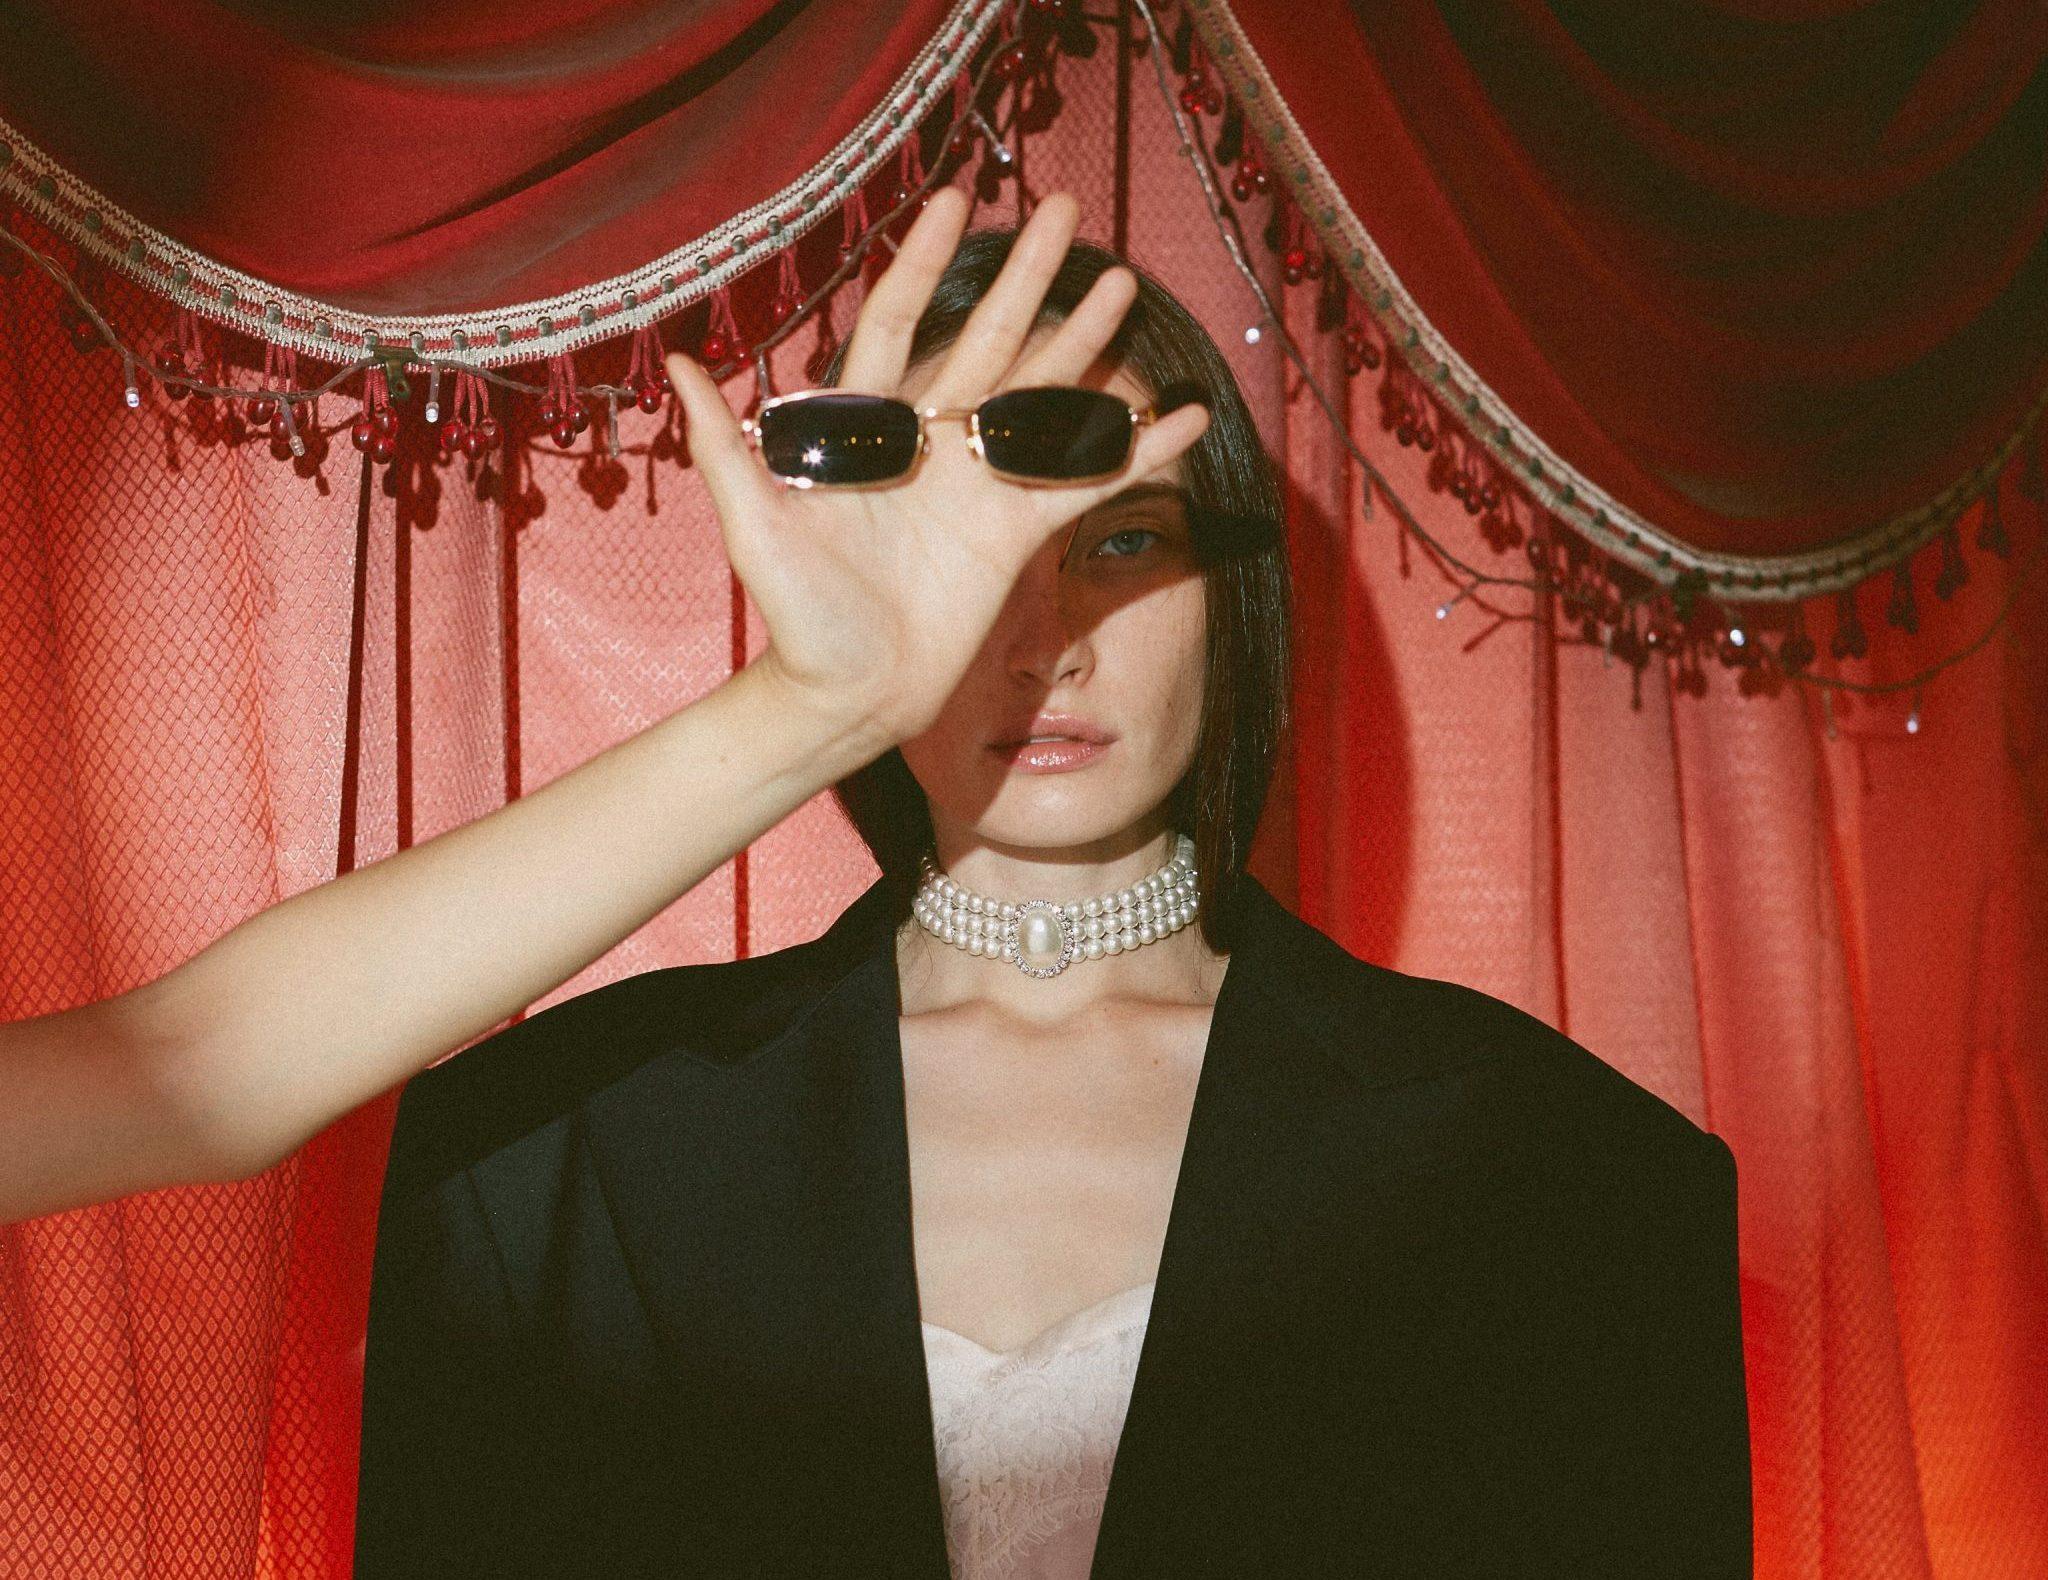 Sasha Dzhuglo by Gunn Kochapanya Sasha Dzhuglo by Gunn Kochapanya Vanity Teen 虚荣青年 Menswear & new faces magazine